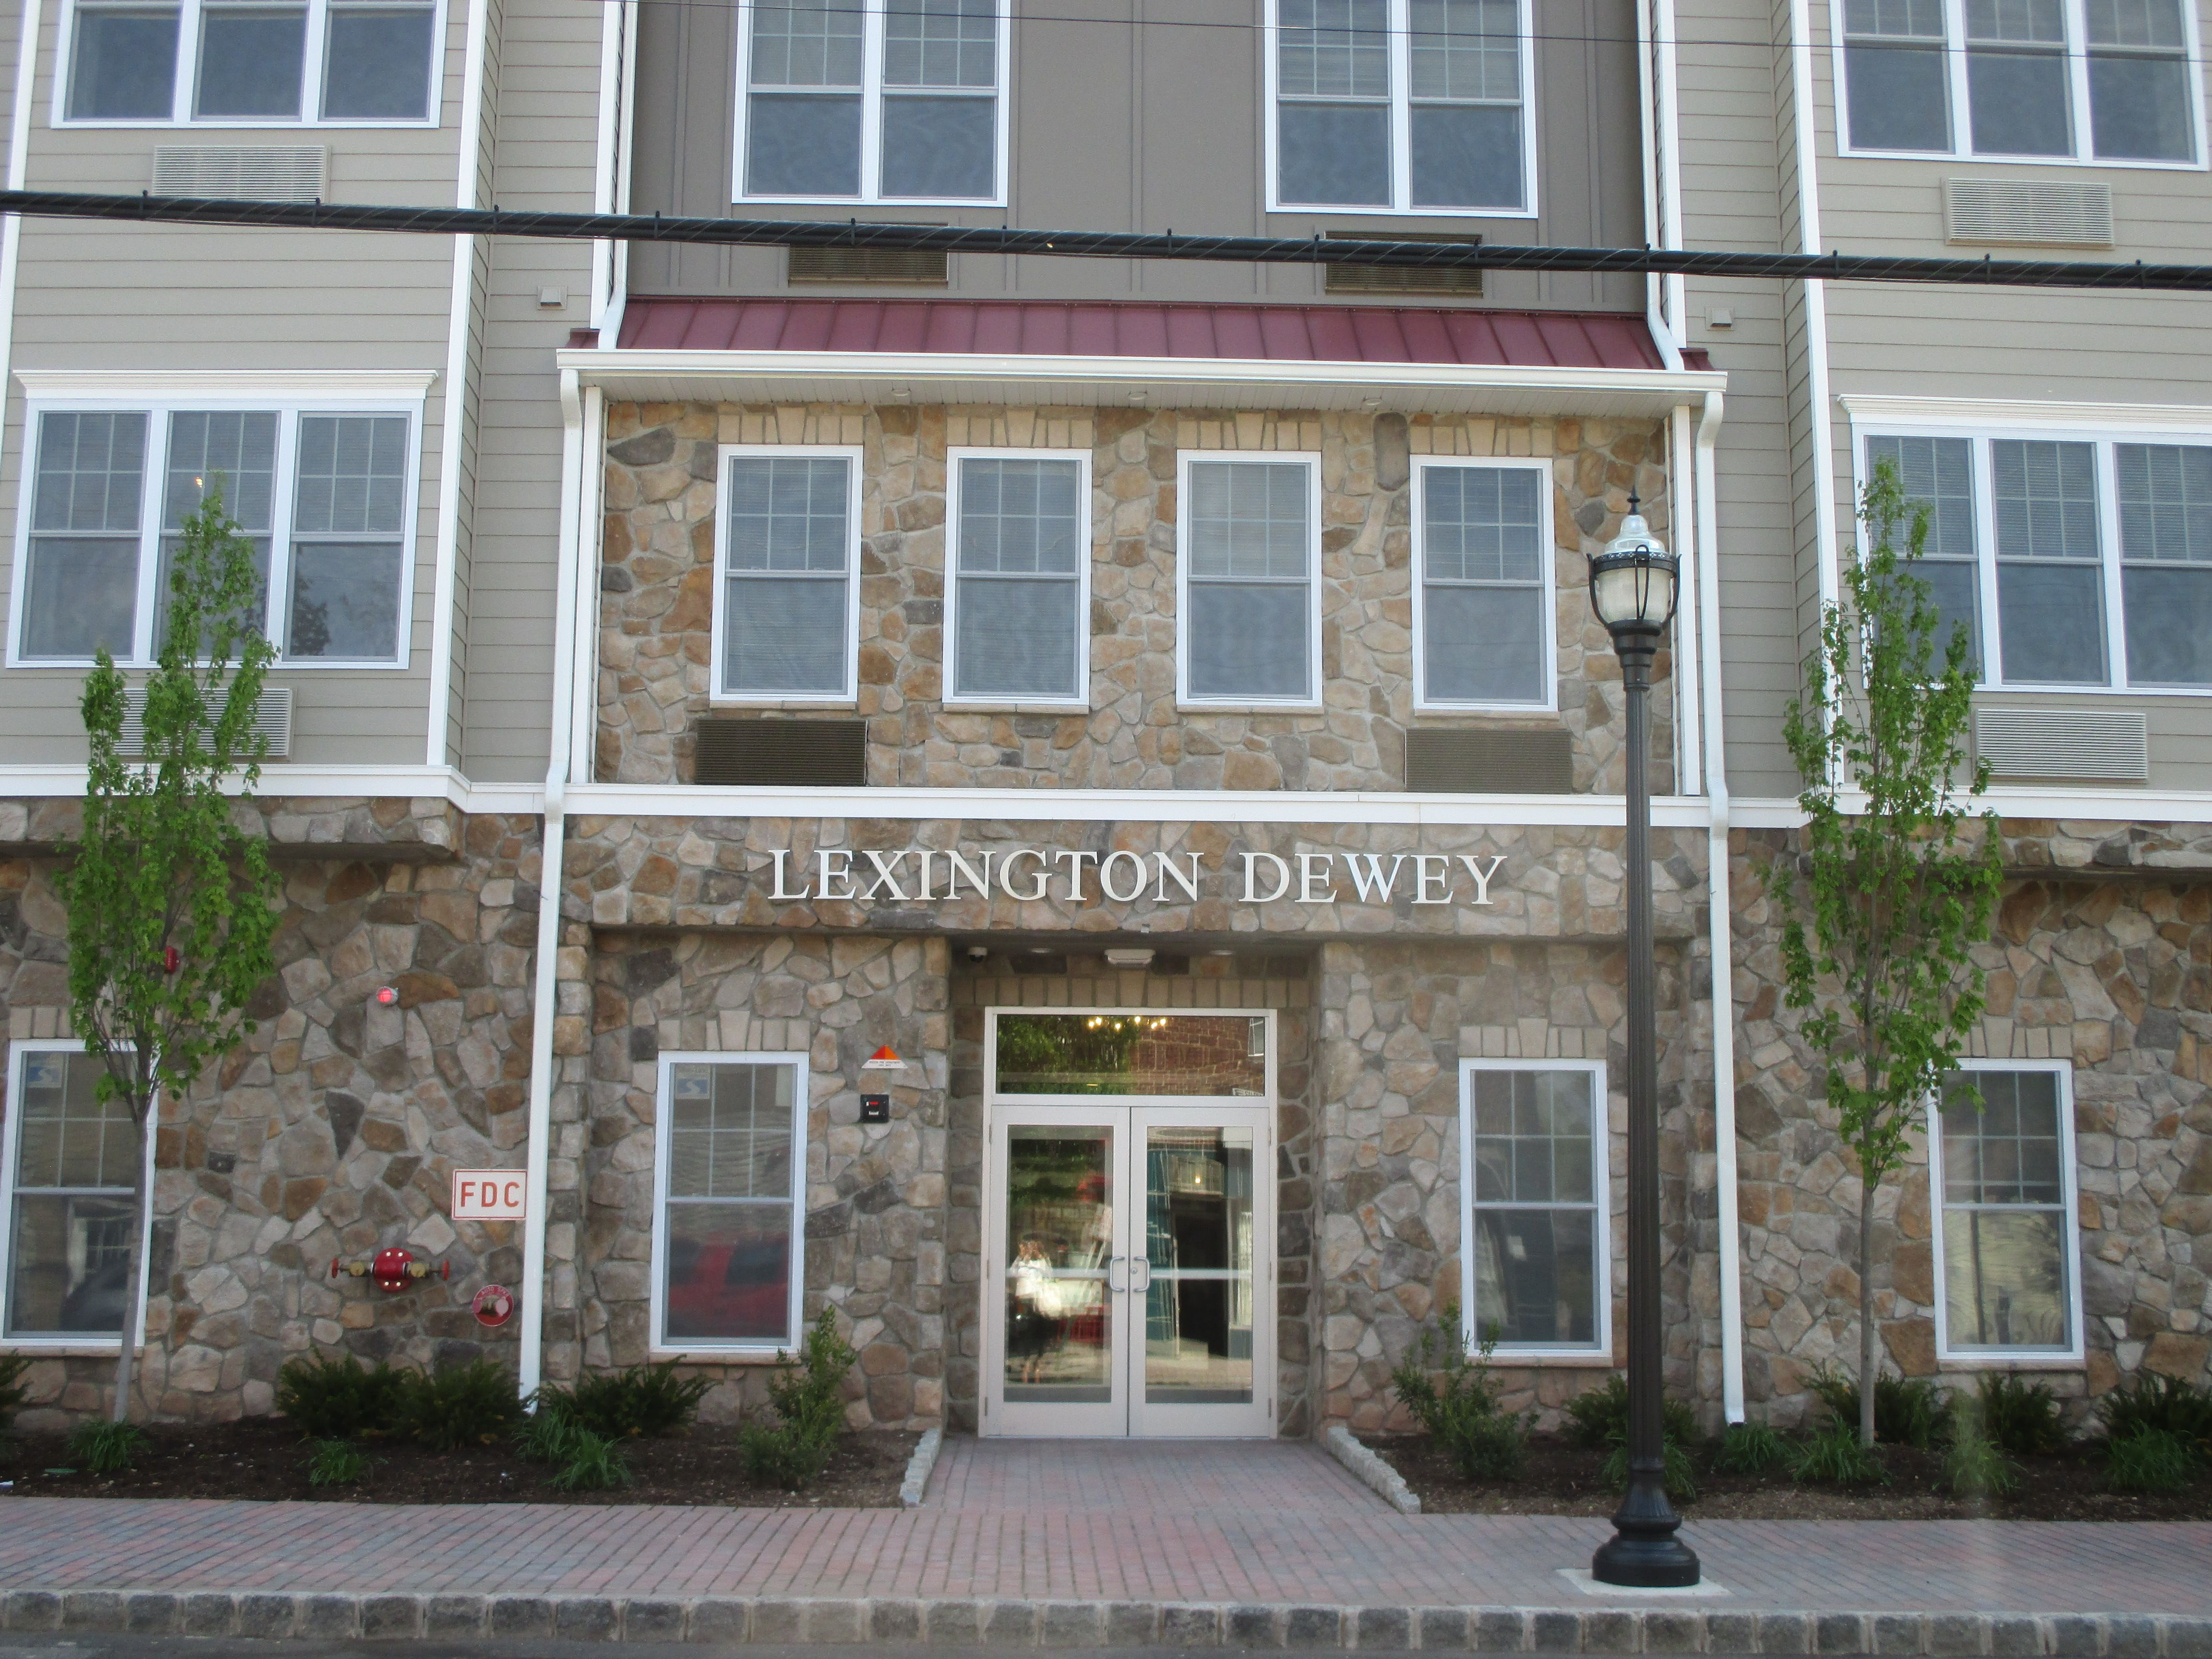 Wel e to the Lexington Dewey Apartments 297 Palisade Ave Bogota